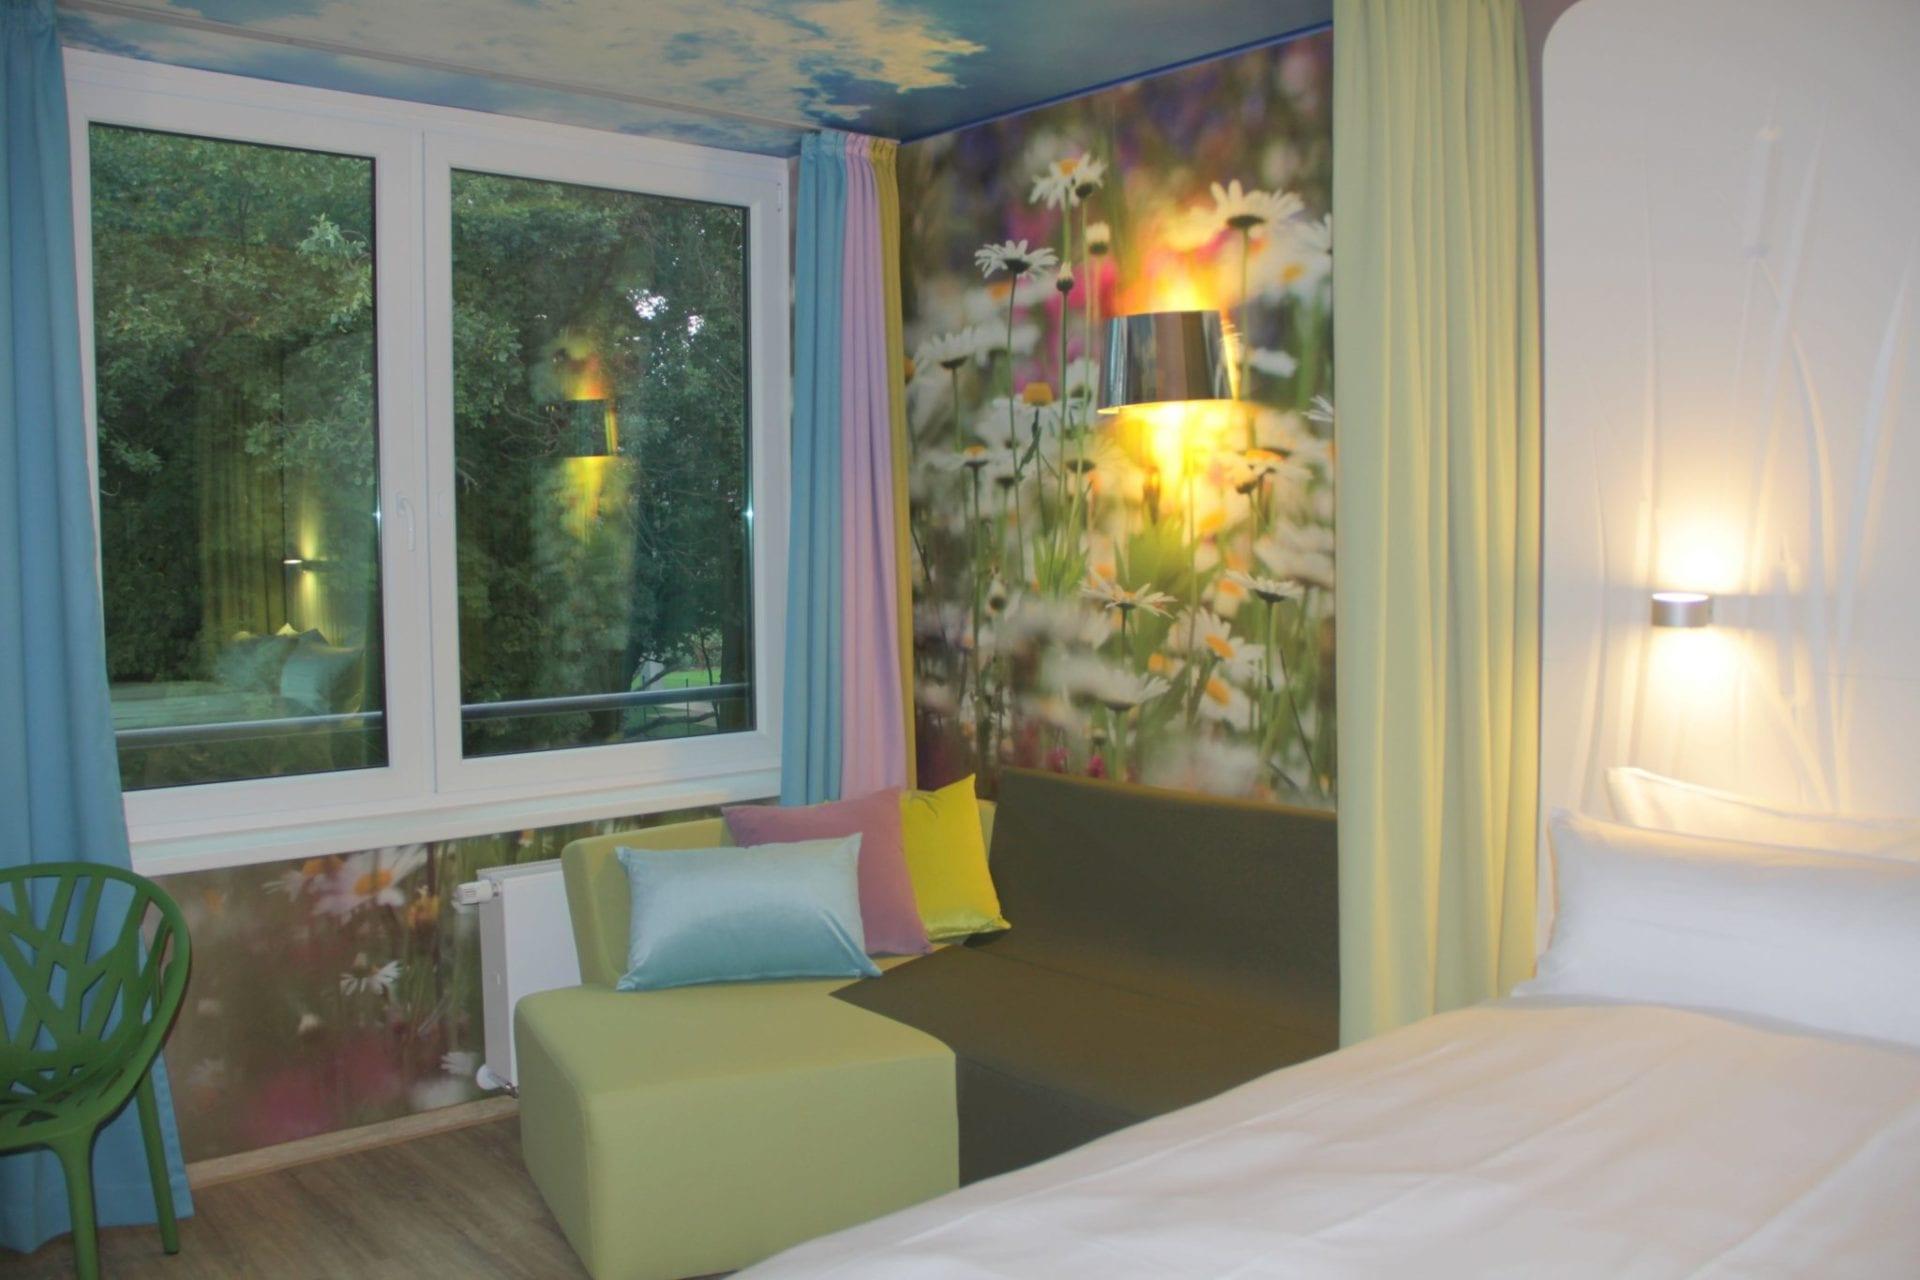 a-ja Resort Bad Saarow Zimmer